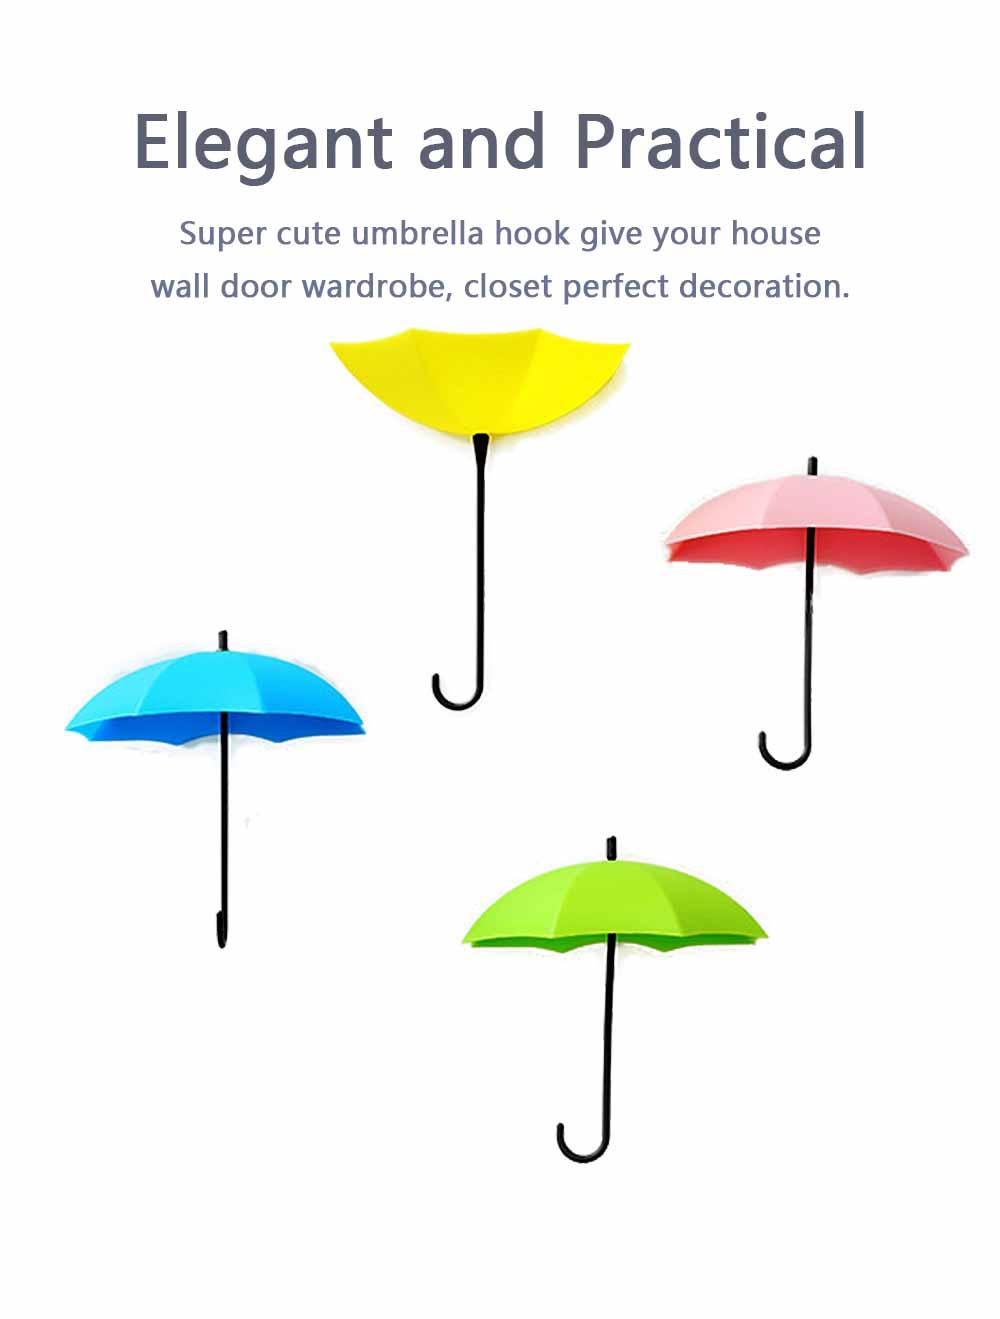 Umbrella Wall Hooks, Cute Little Sticky Hanging Hooks for Hat Purse Key Storage (3 packs) 5